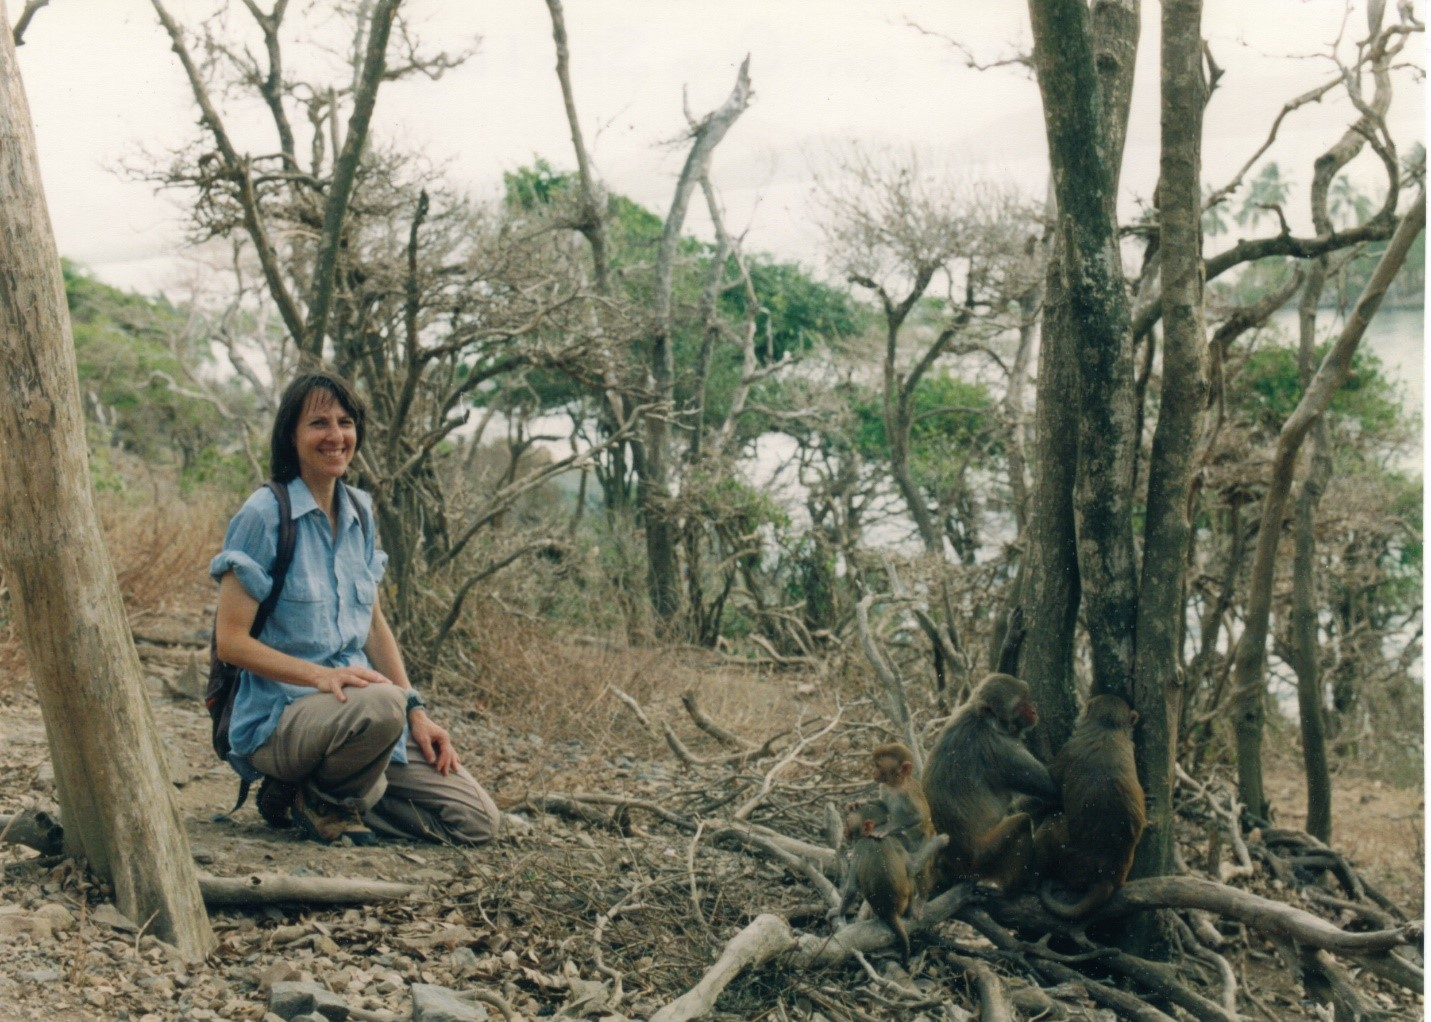 Приматолог Кэрол Берман (Carol Berman) наблюдает за макаками наКайо Сантьяго. 1994г.